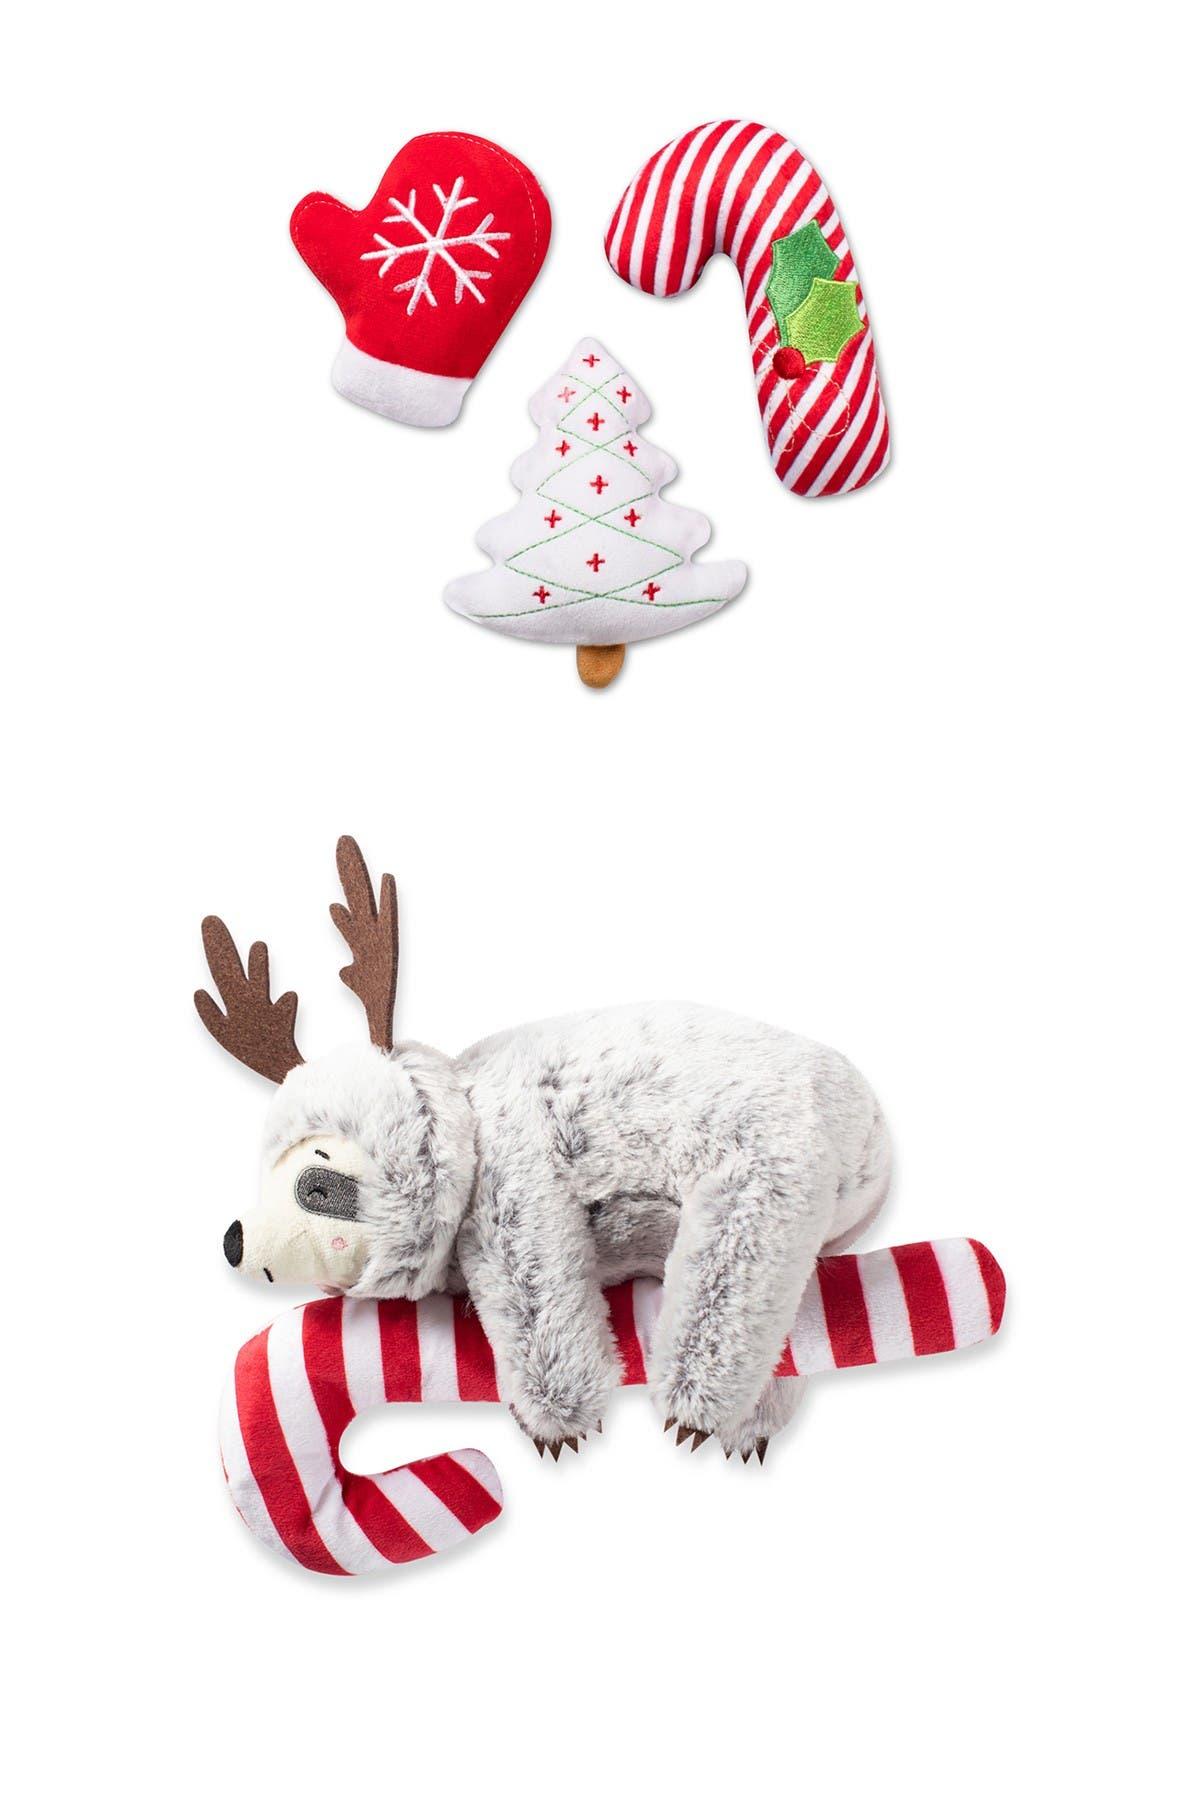 Image of Fringe Studio Sloth Hanging On a Candy Cane and Christmas Icons Mini 4-Piece Dog Toy Set